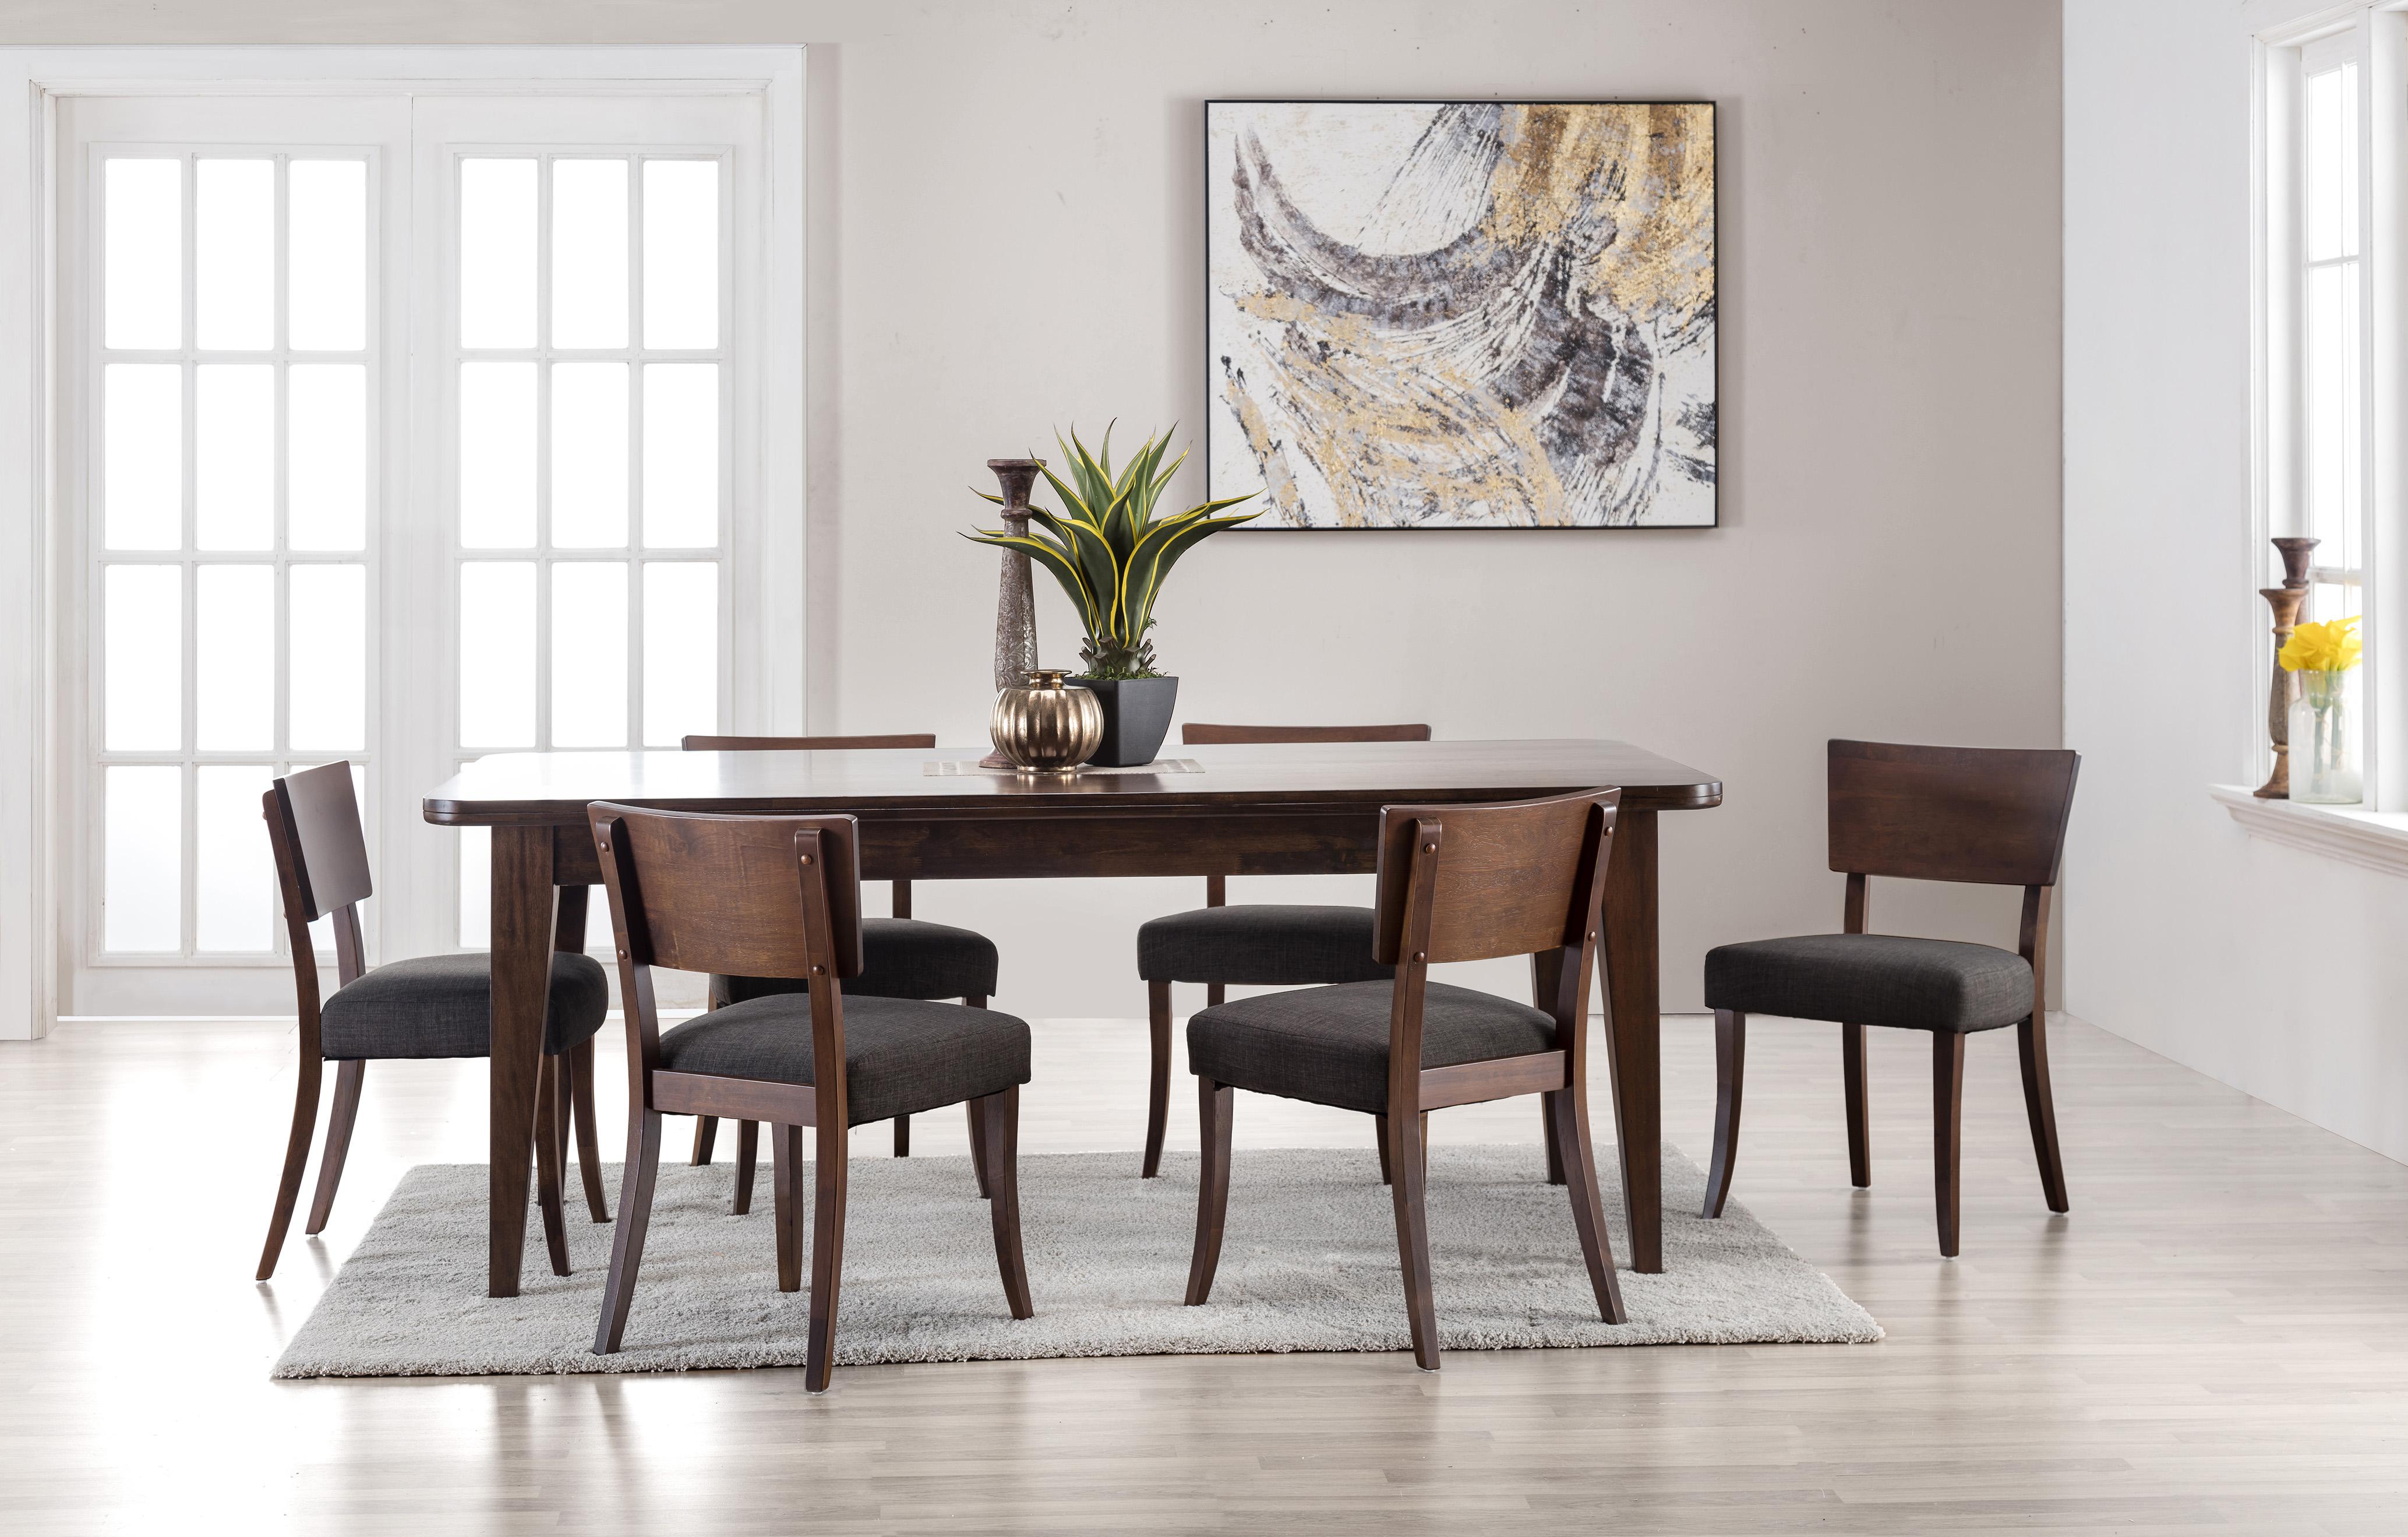 New Dining Table Set Harvey norman Light of Dining Room : HANSDiningSet28LifestyleStyle292017041401196 from www.lightofdiningroom.com size 4134 x 2638 jpeg 1806kB